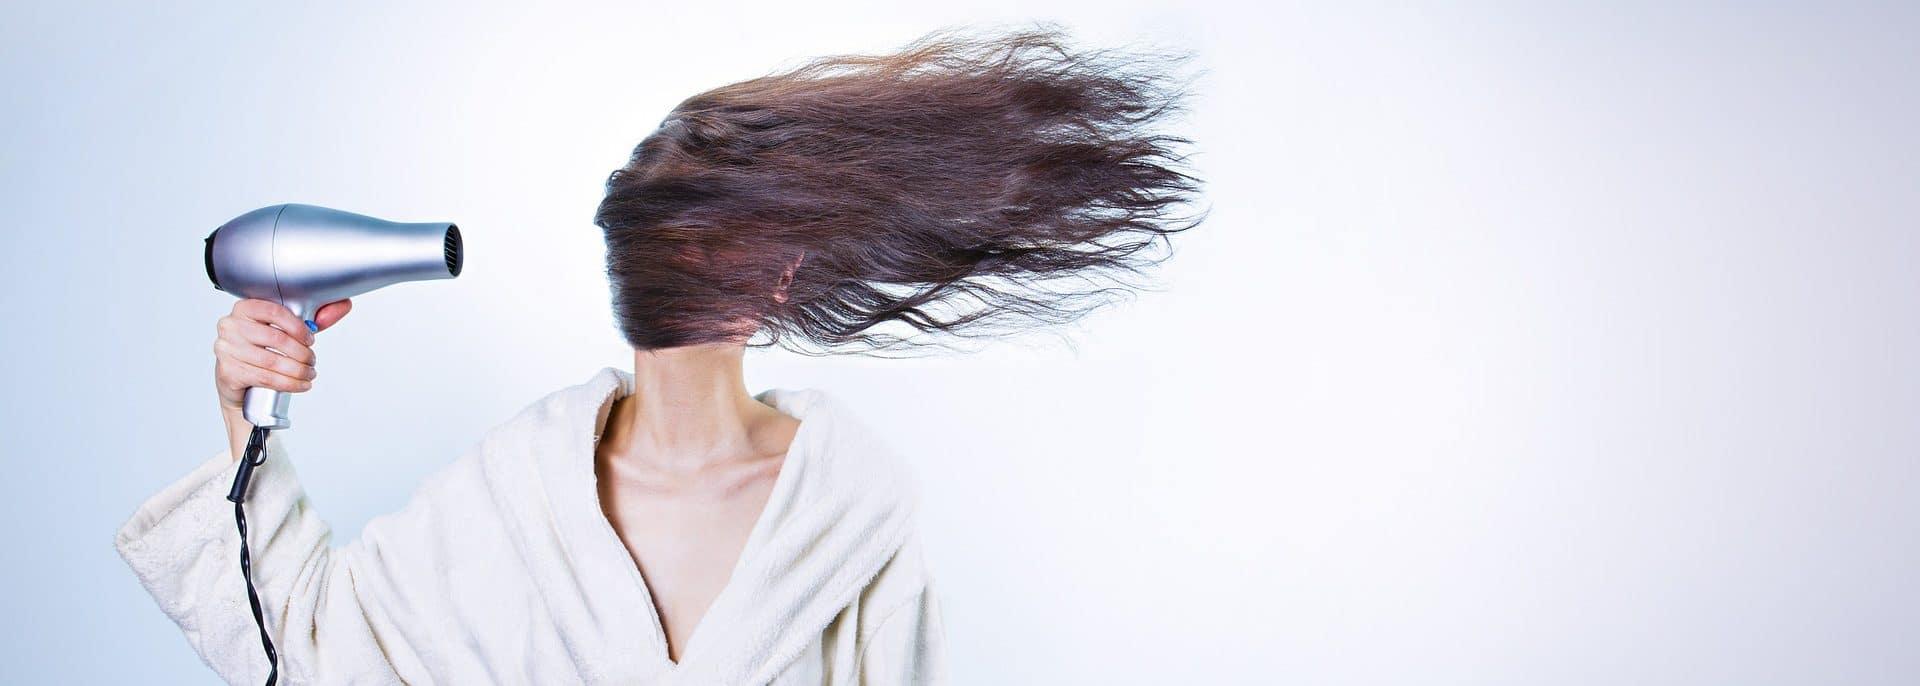 Frau fönt sich Haare